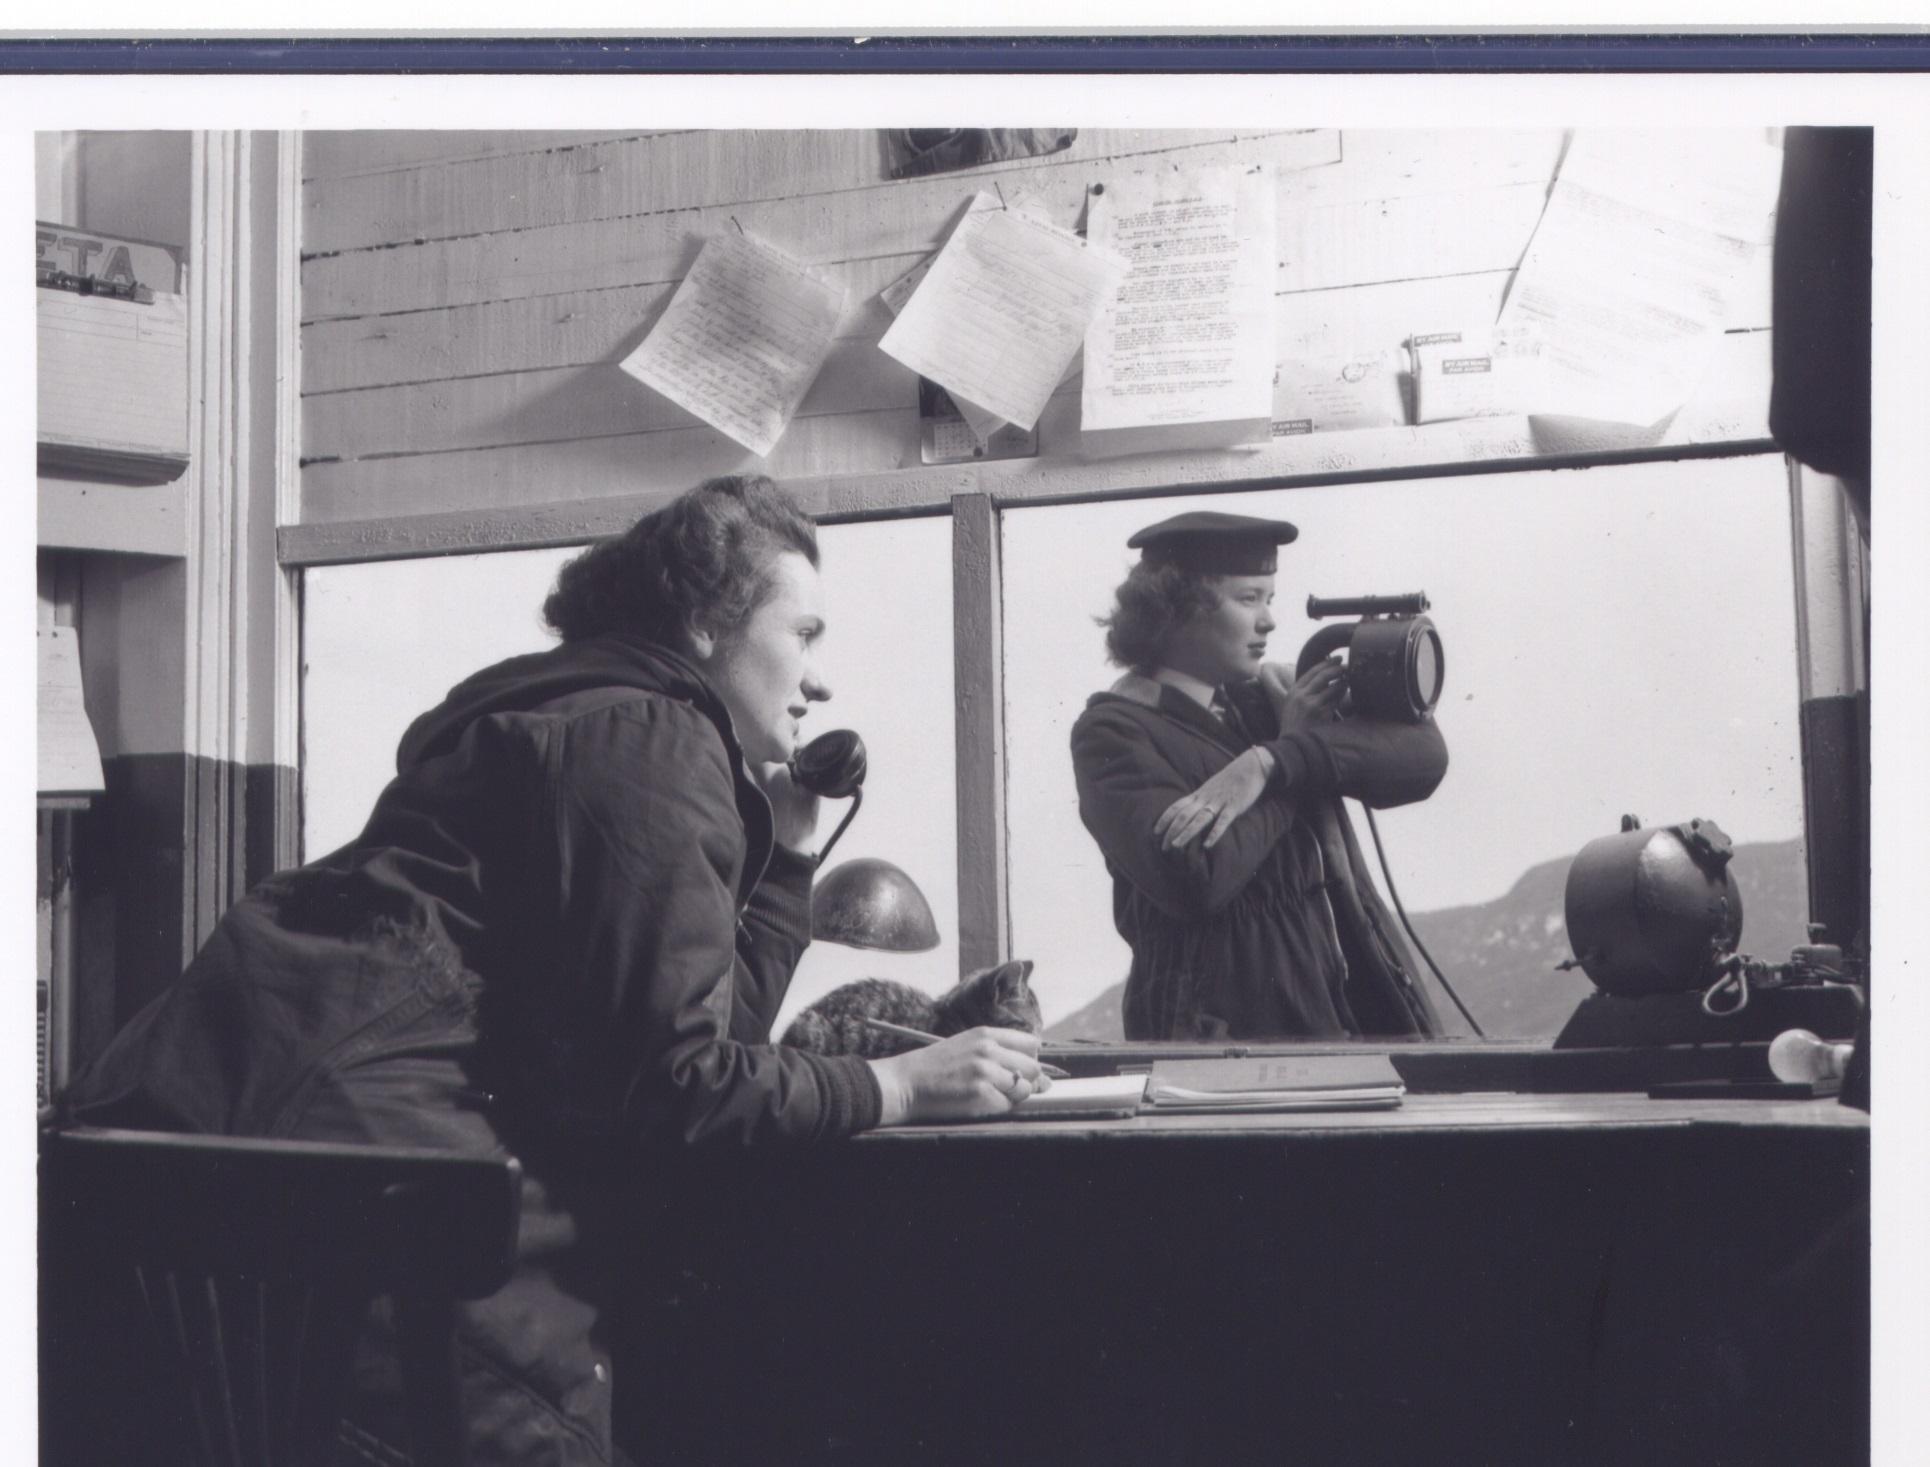 Service féminin de la Marine royale du Canada (WRCNS)